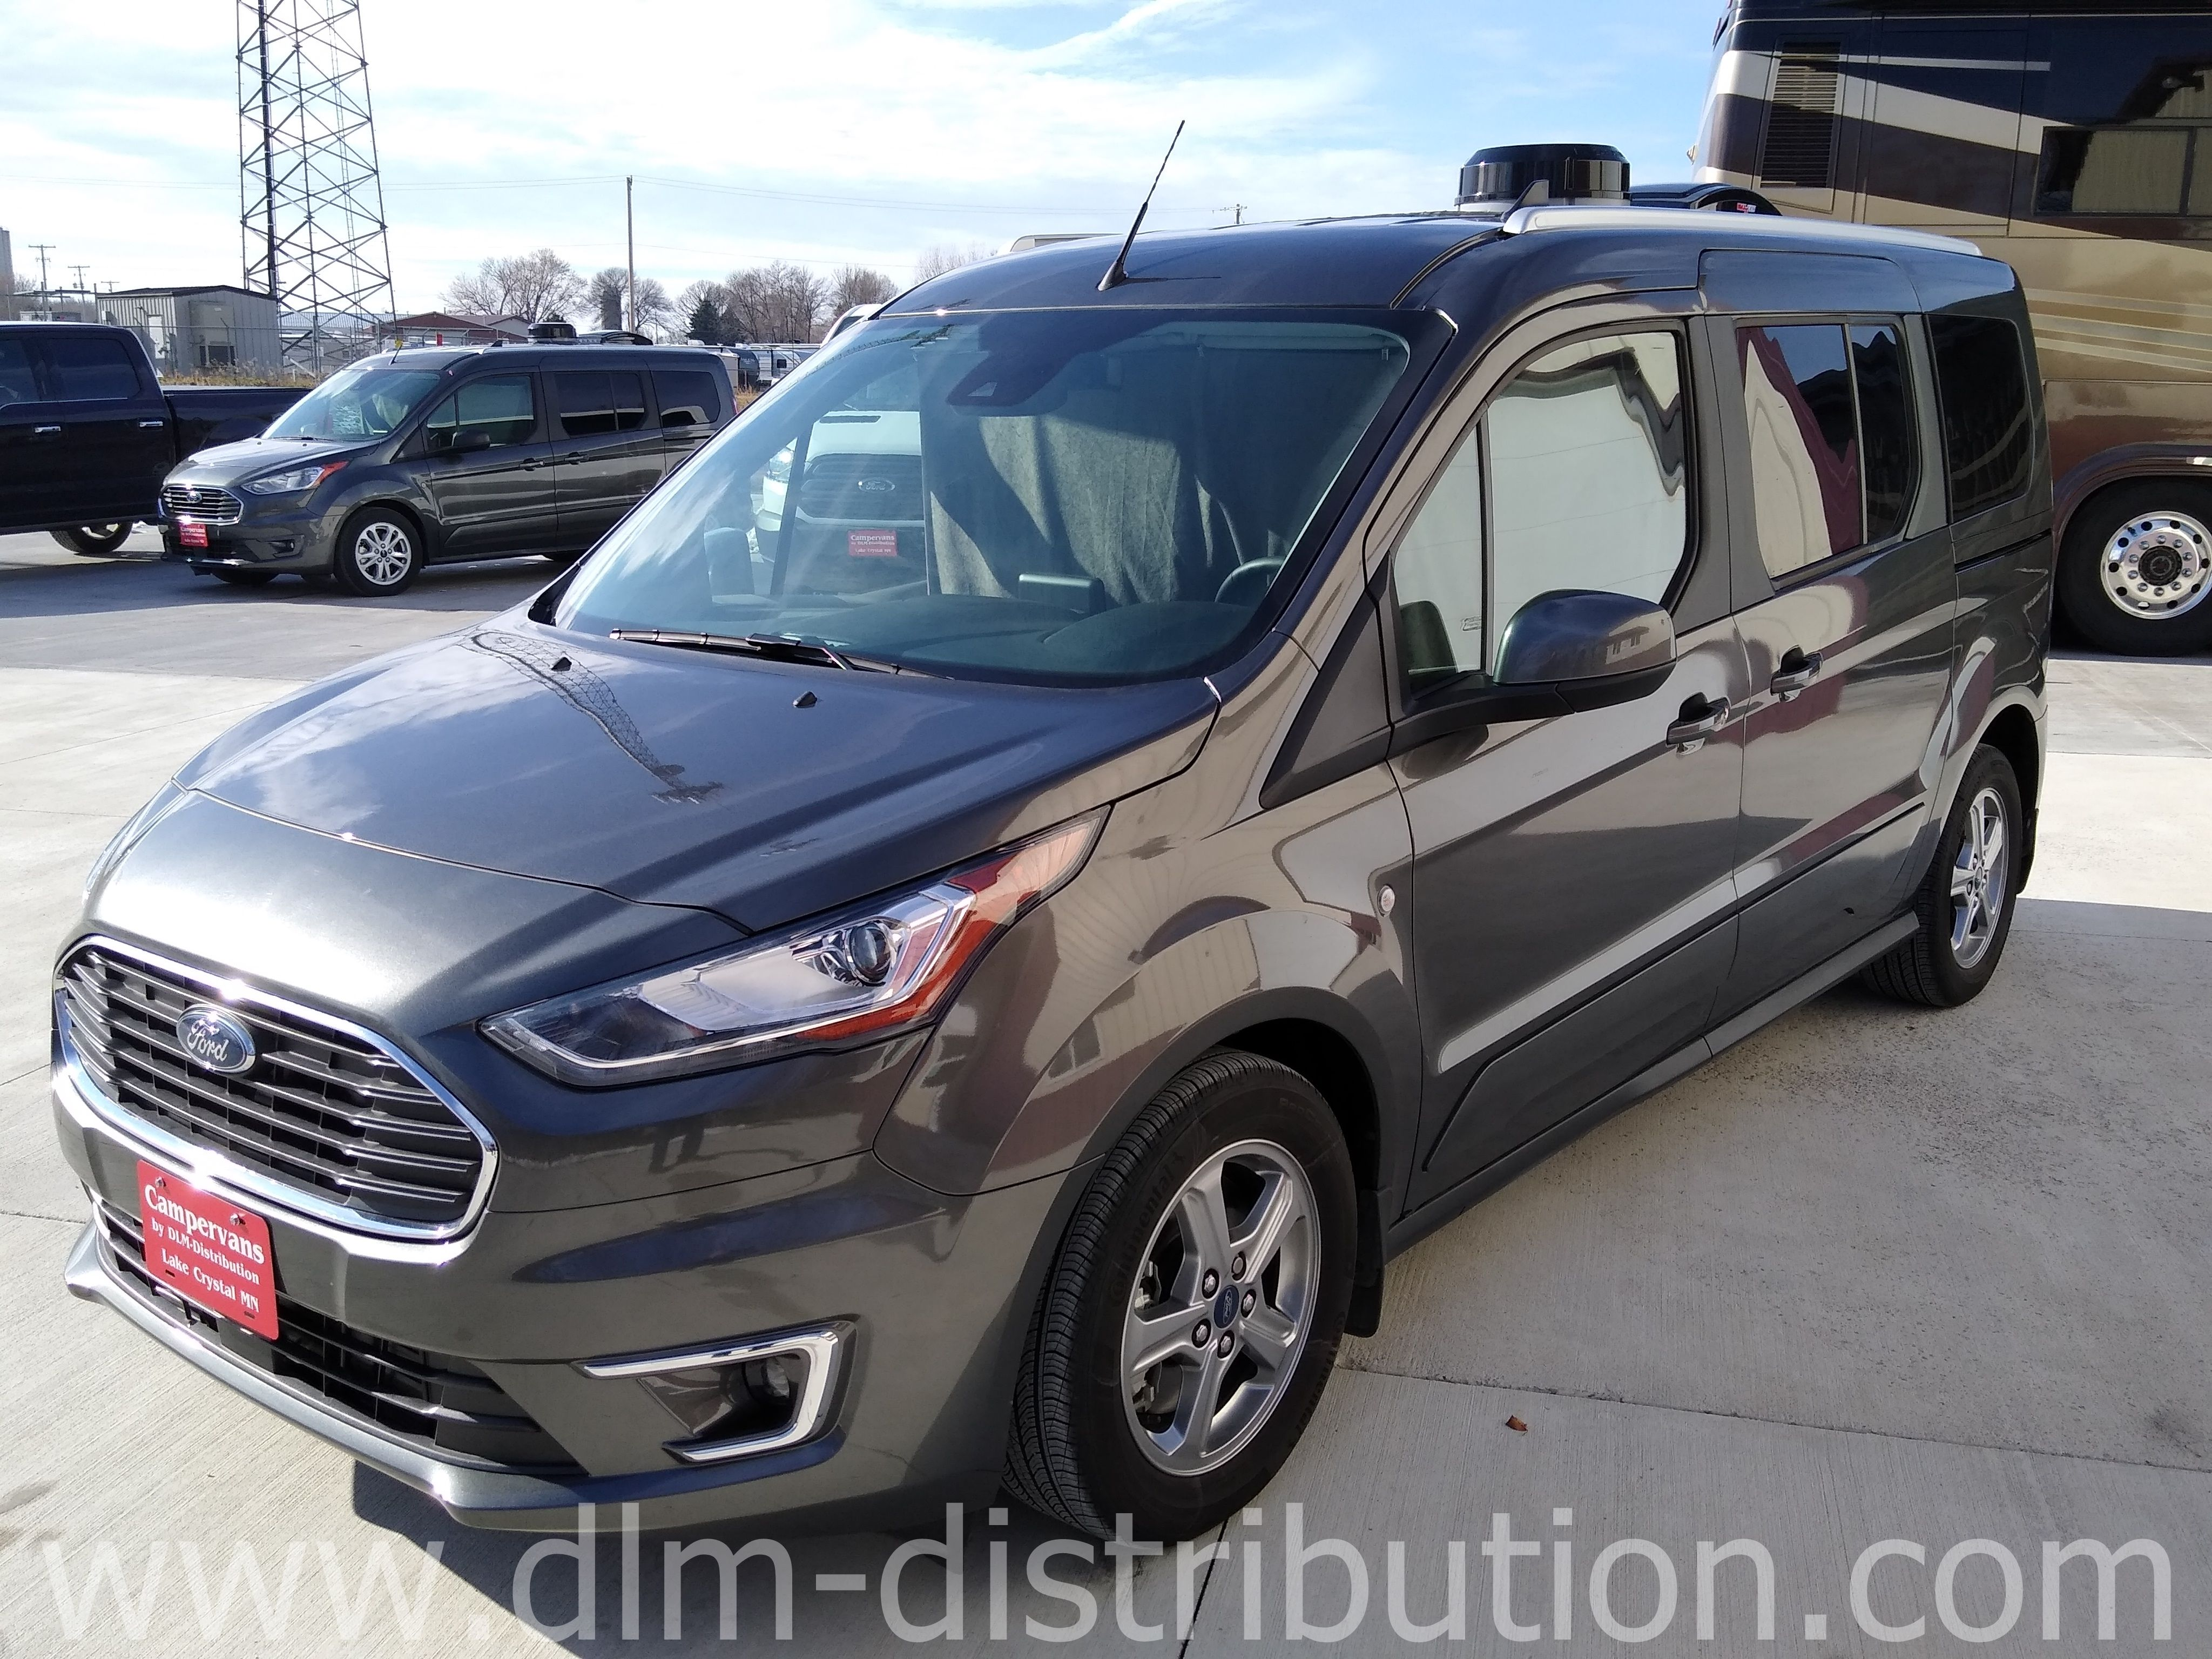 Garageable Camper Van For Sale 2019 Mini T Campervan Visit Https